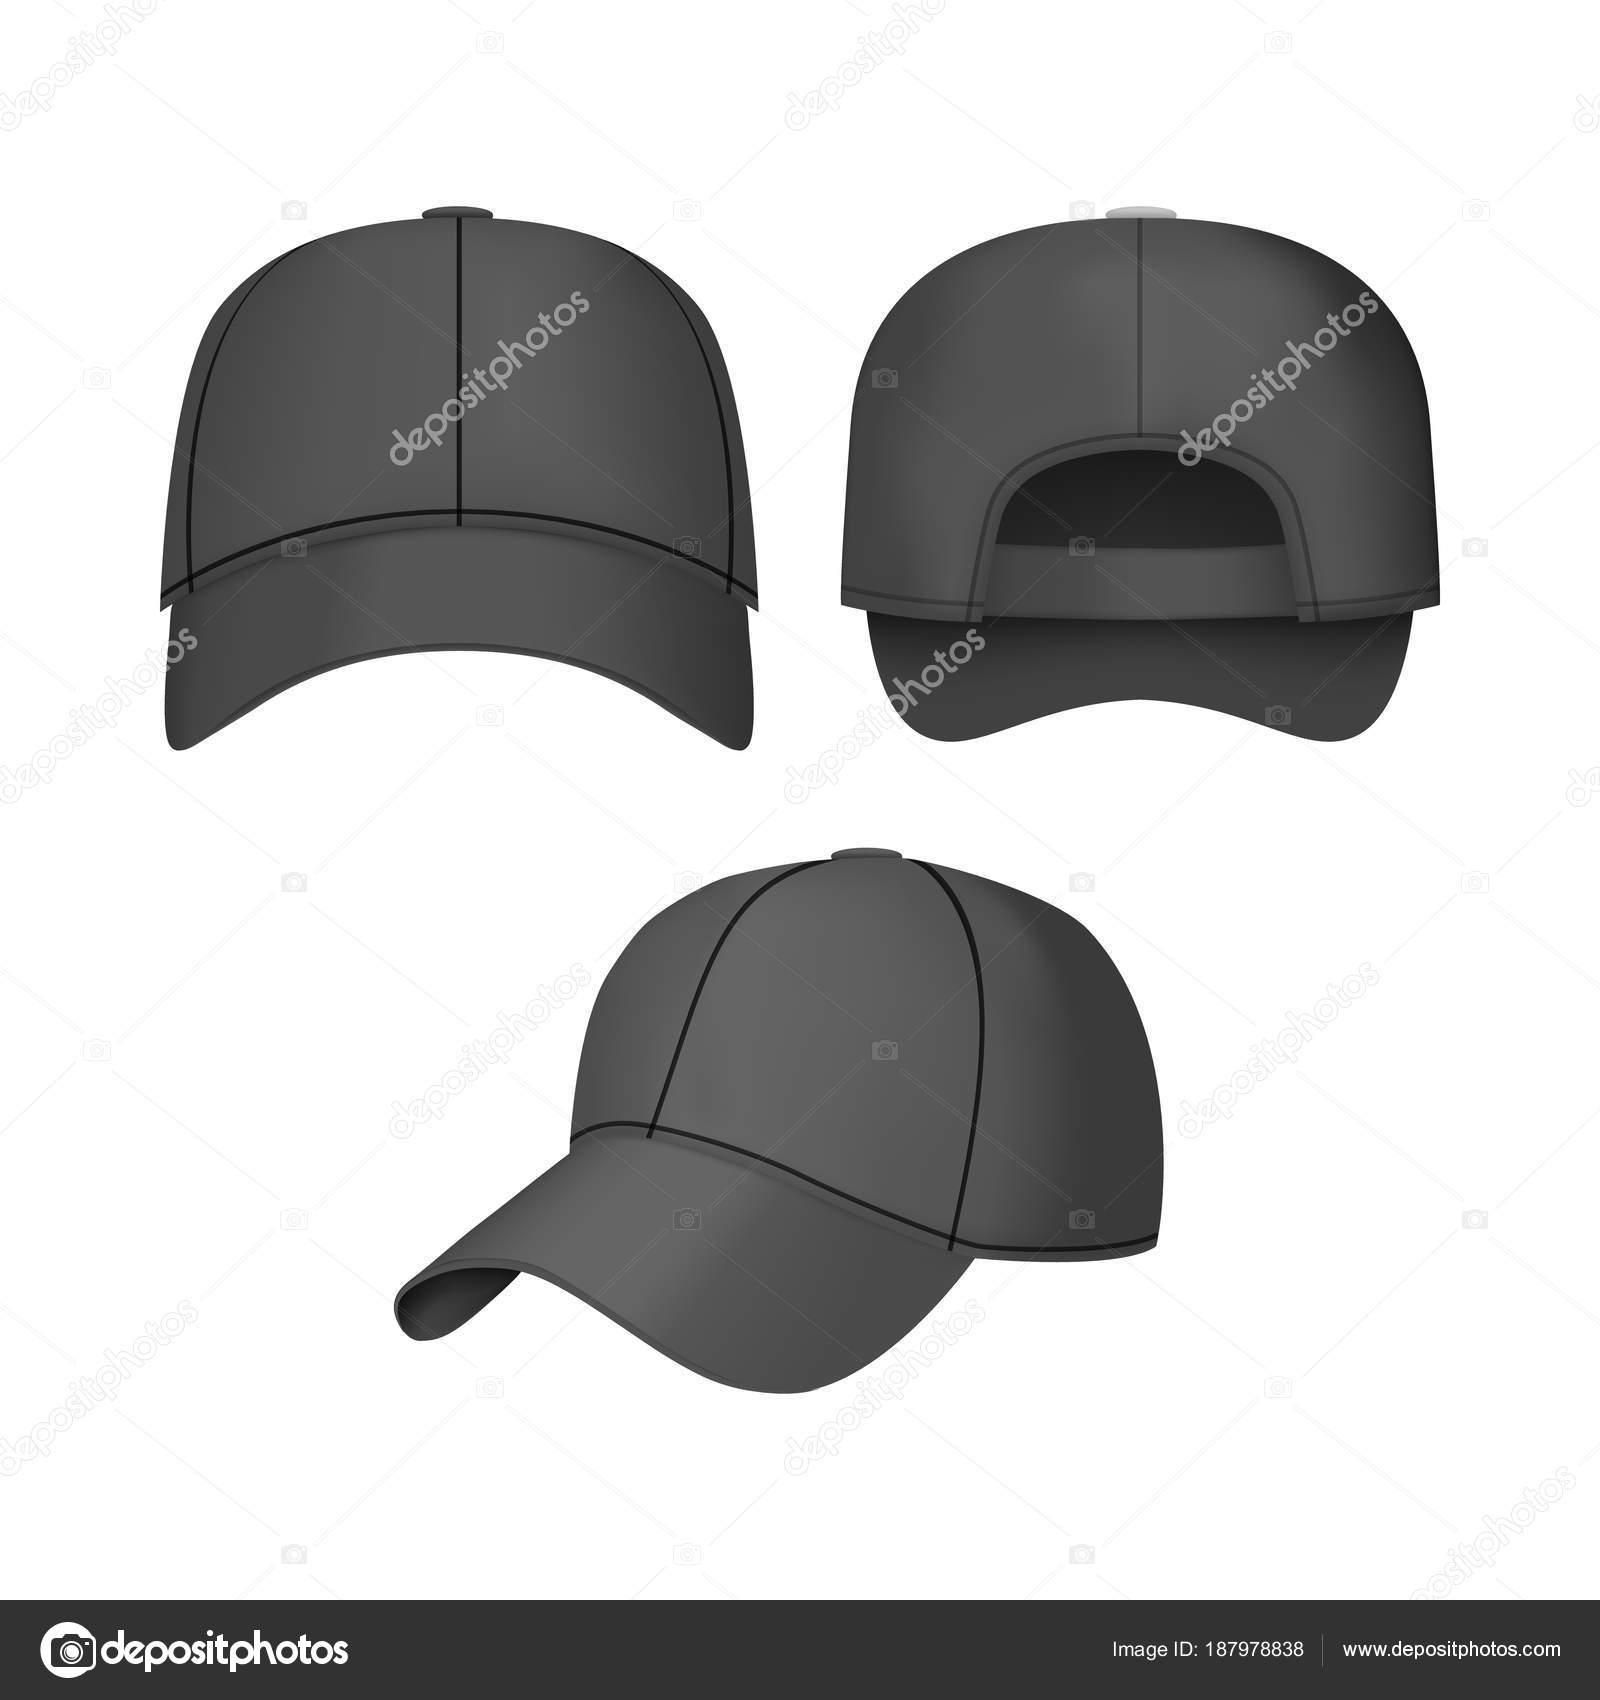 Realista 3d gorra de béisbol negra retroceder frente y vistas laterales en  fondo claro. Ilustración de vector de Moda Casual - vector  gorra beisbol  ... b28e89415a2